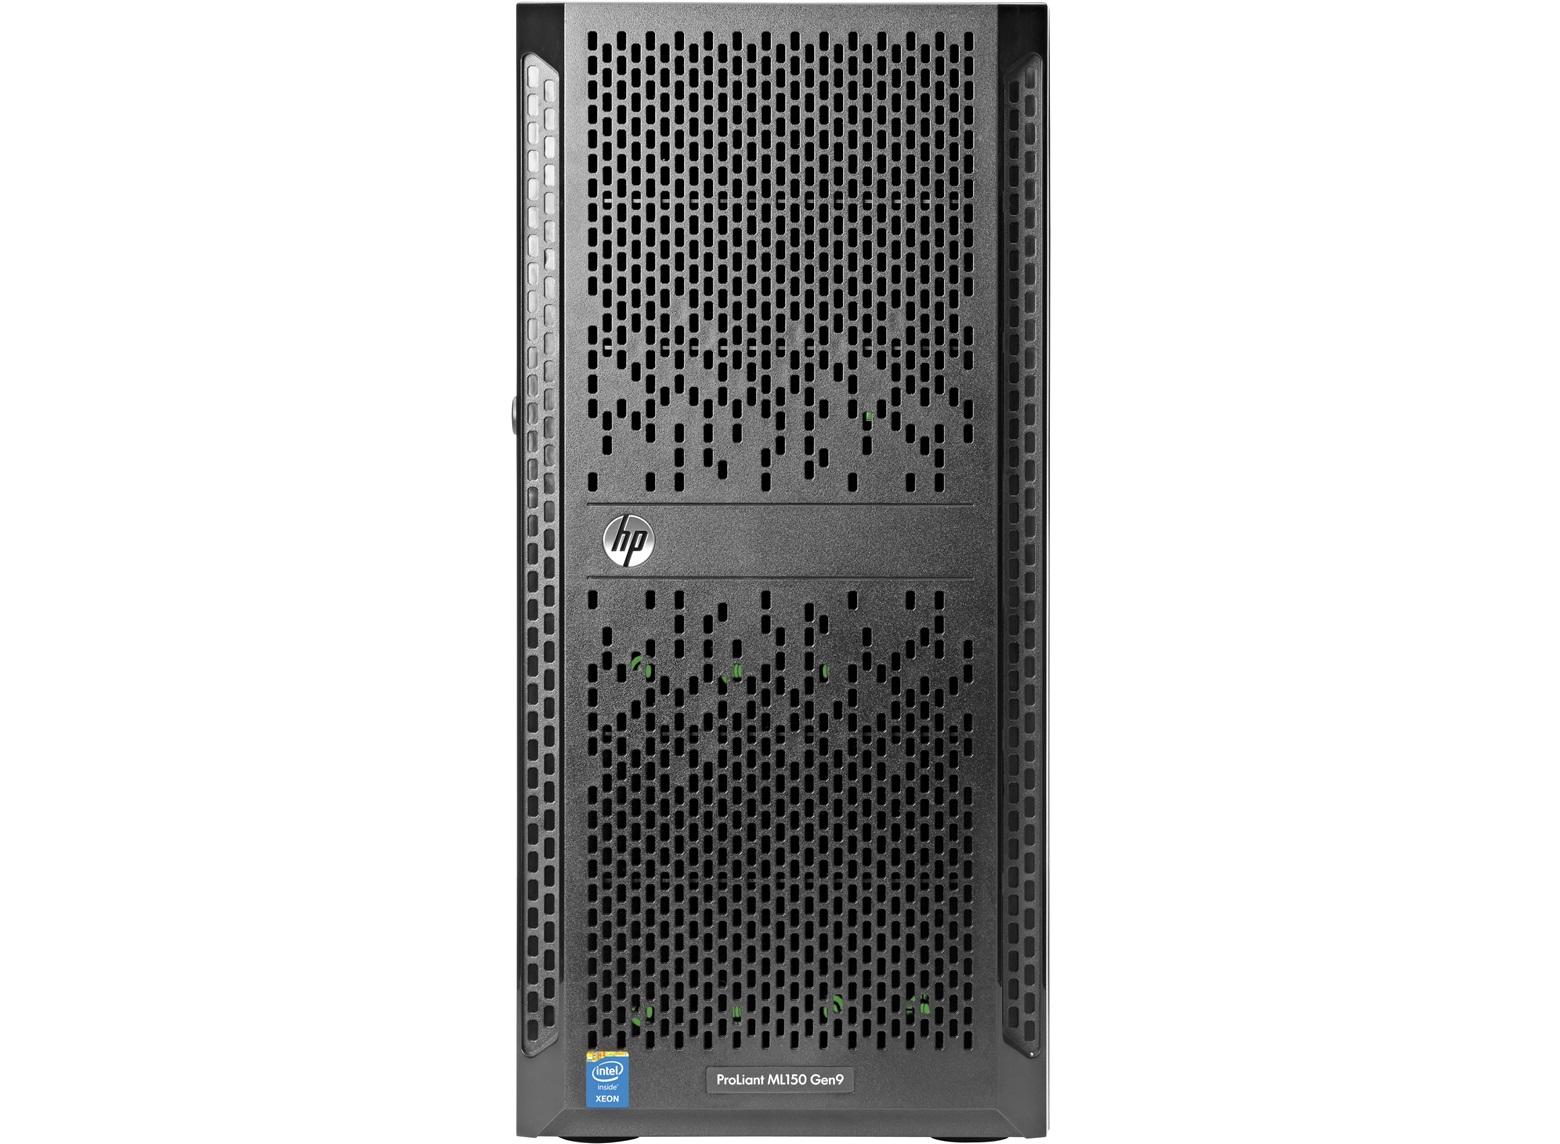 HP ML150 Gen9 E5-2603v3, 4GB, 4 LFF, B140